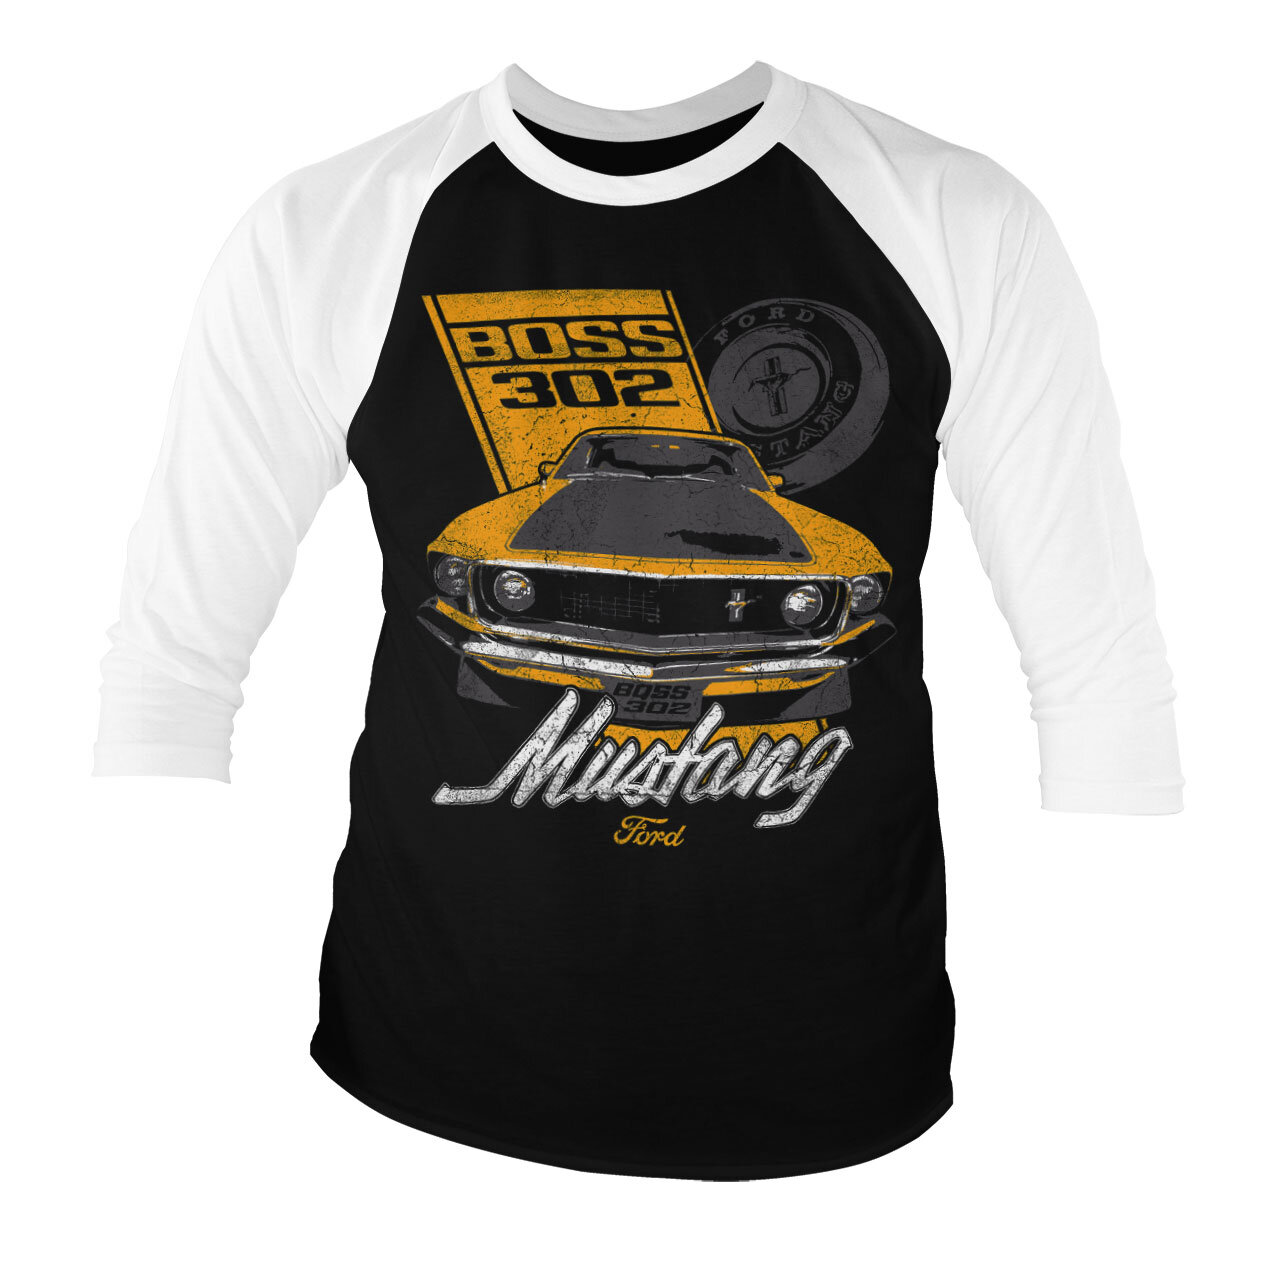 Ford Mustang BOSS 302 Baseball 3/4 Sleeve Tee